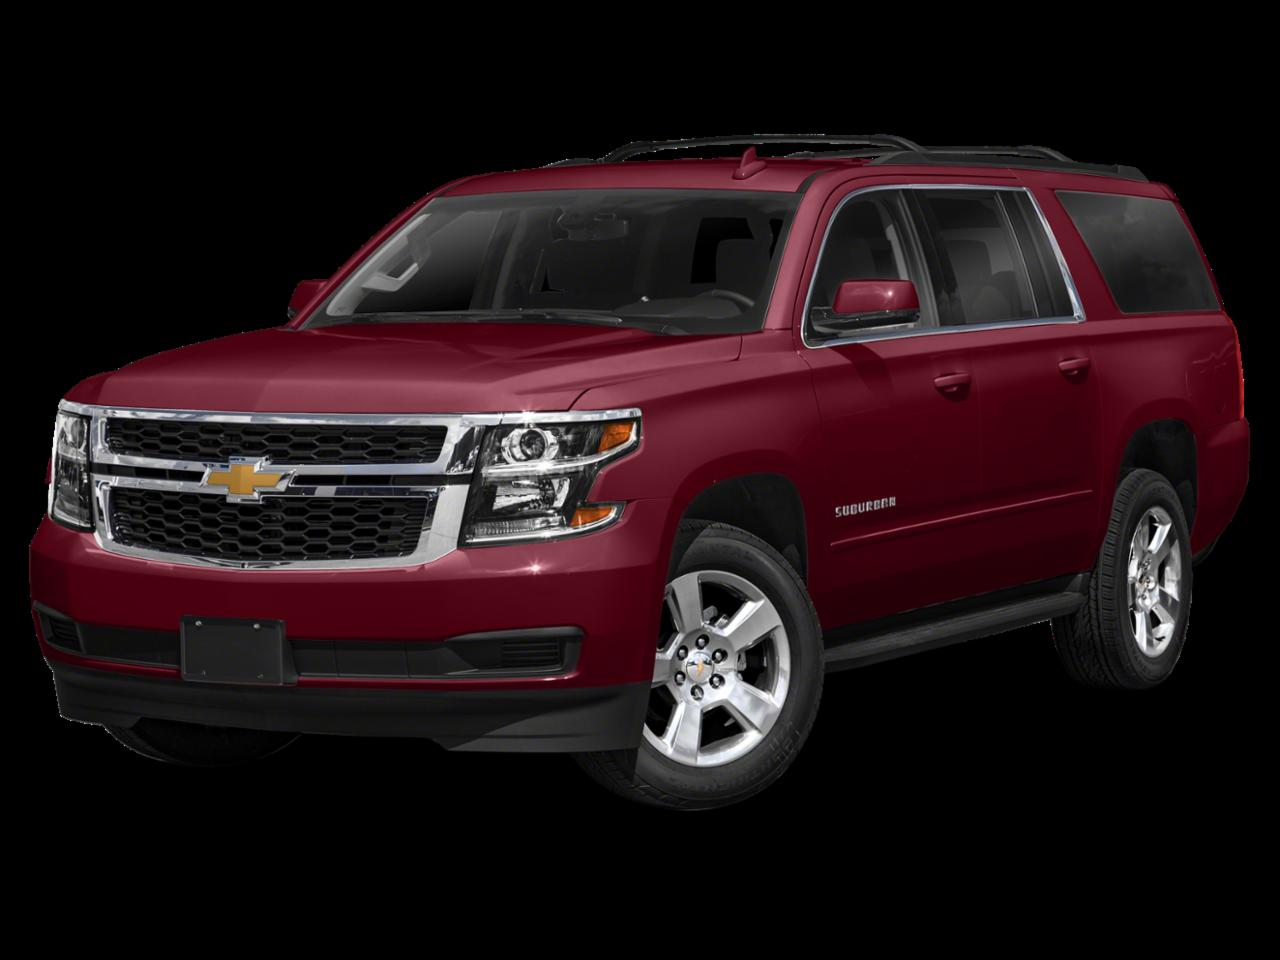 Chevrolet 2020 Suburban LS